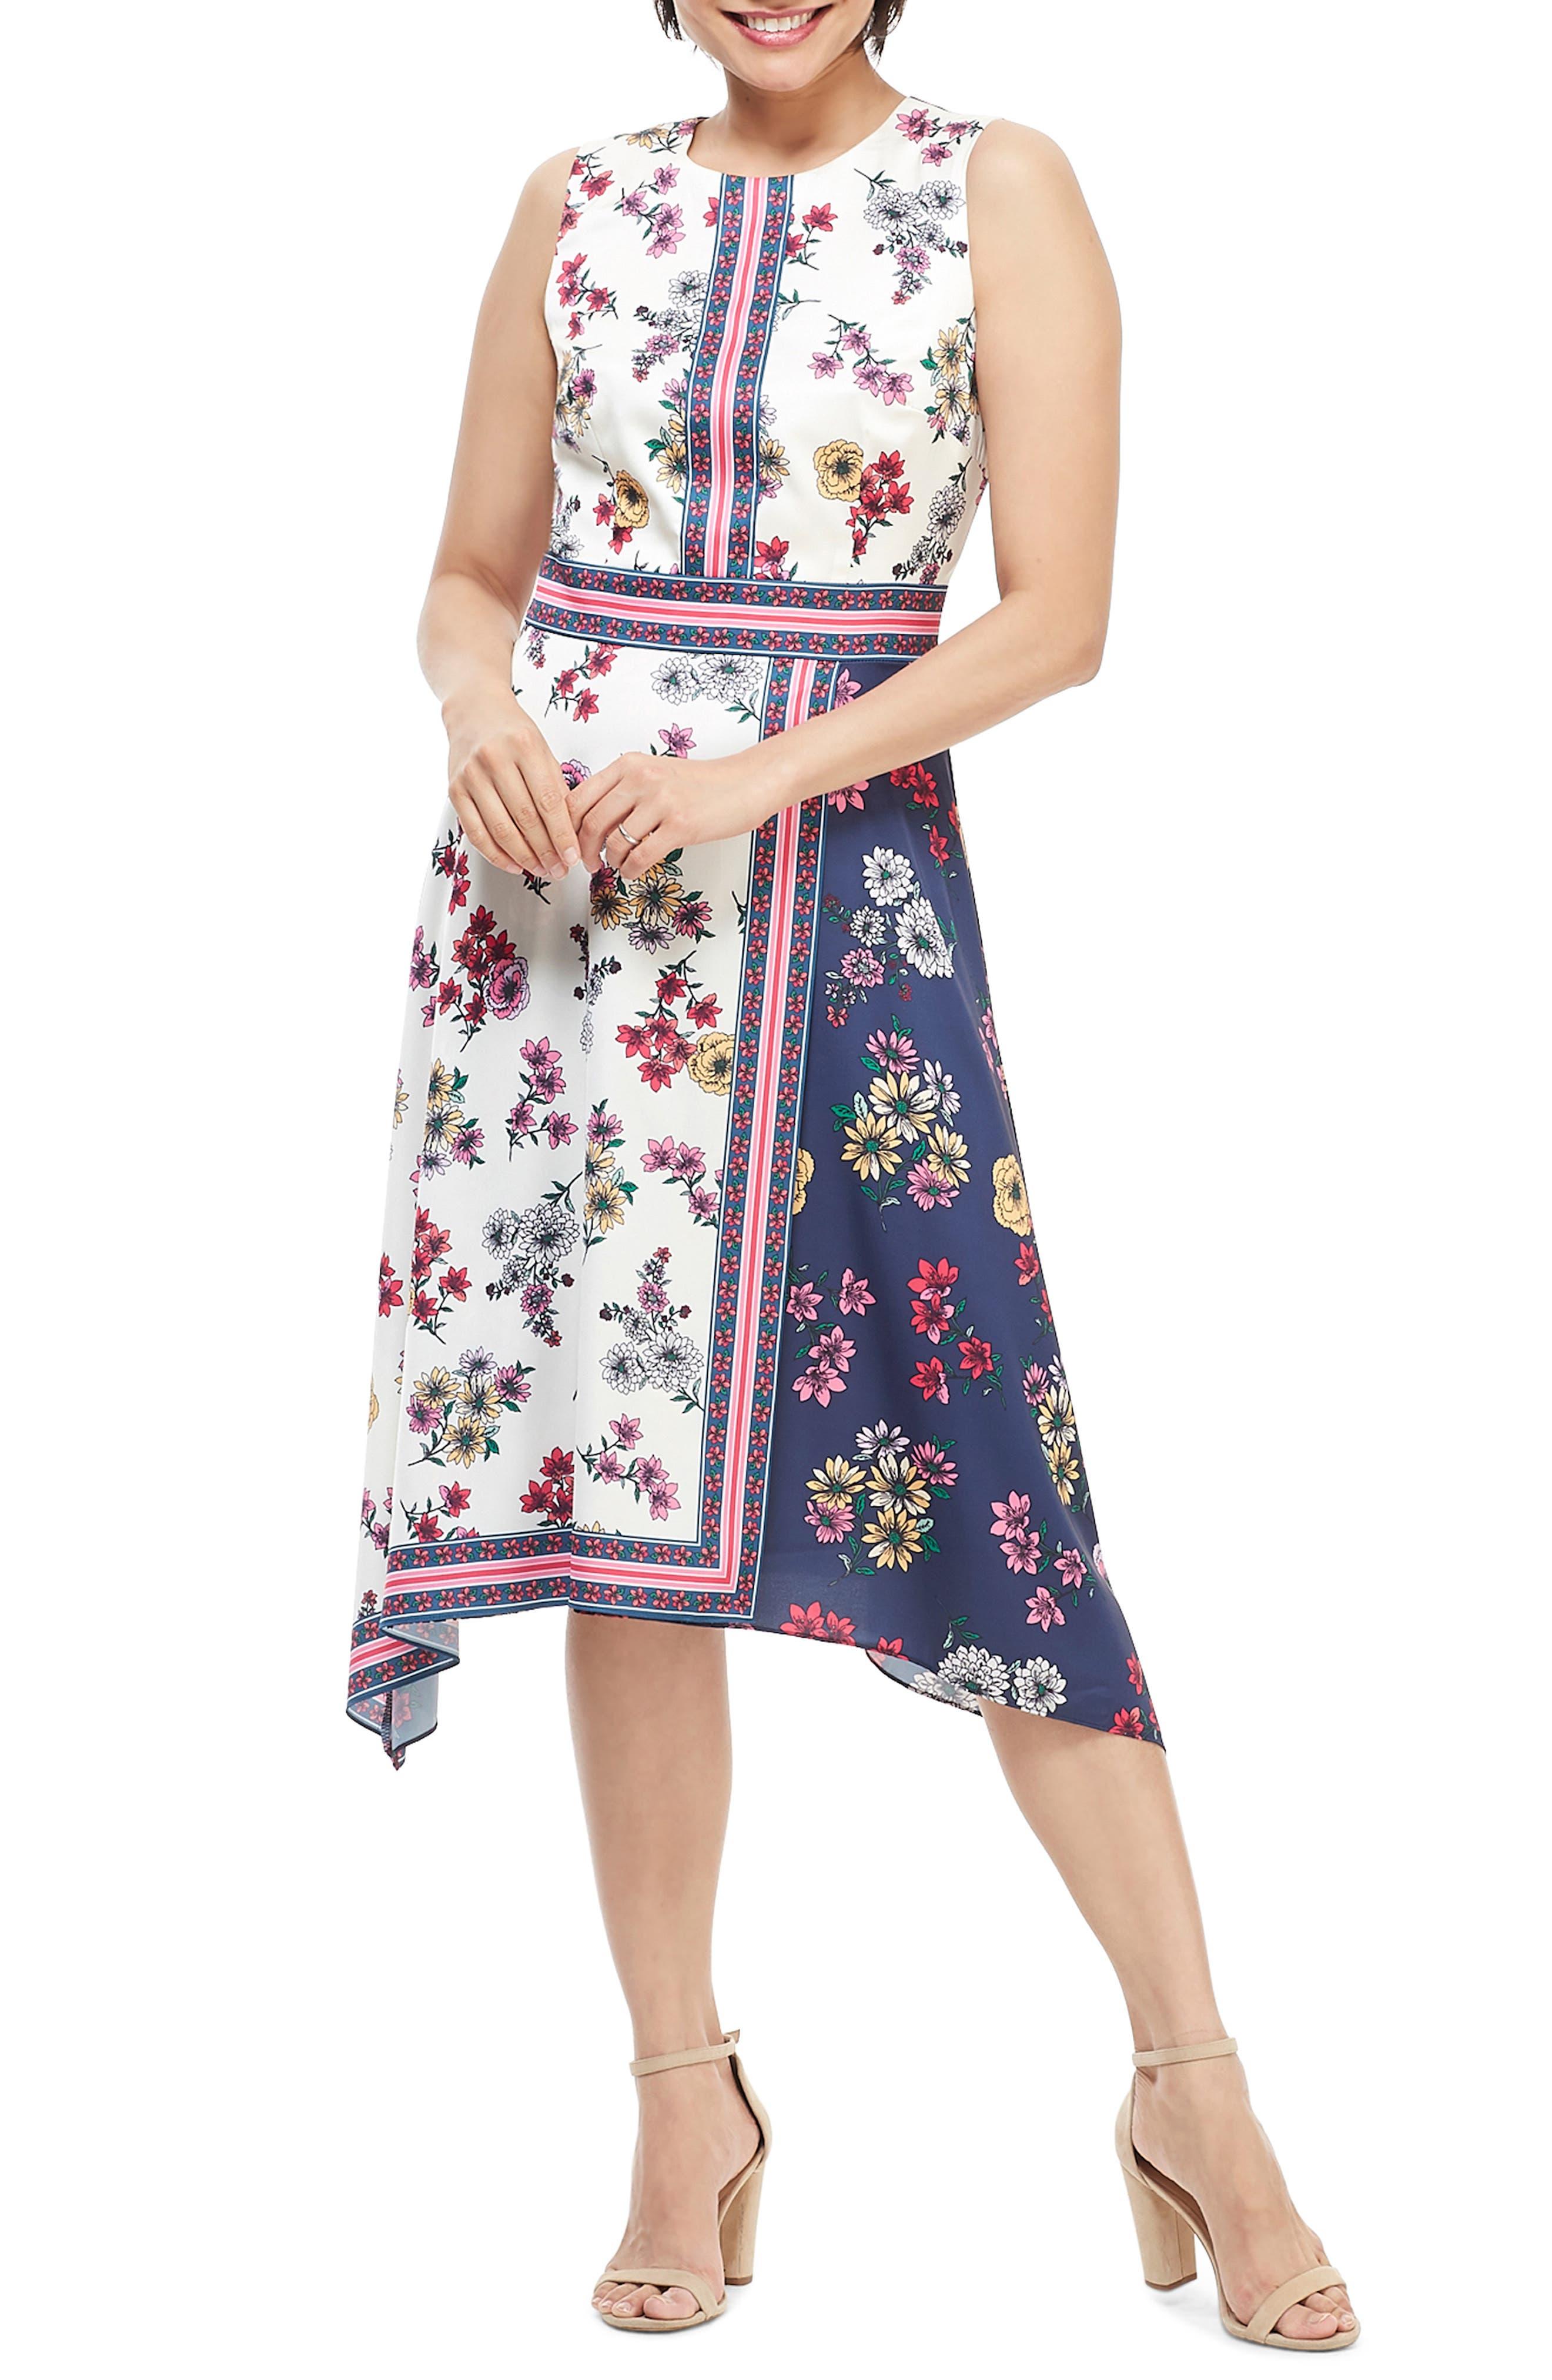 Petite Maggy London Scarf Print Sleeveless Handkerchief Dress, Ivory